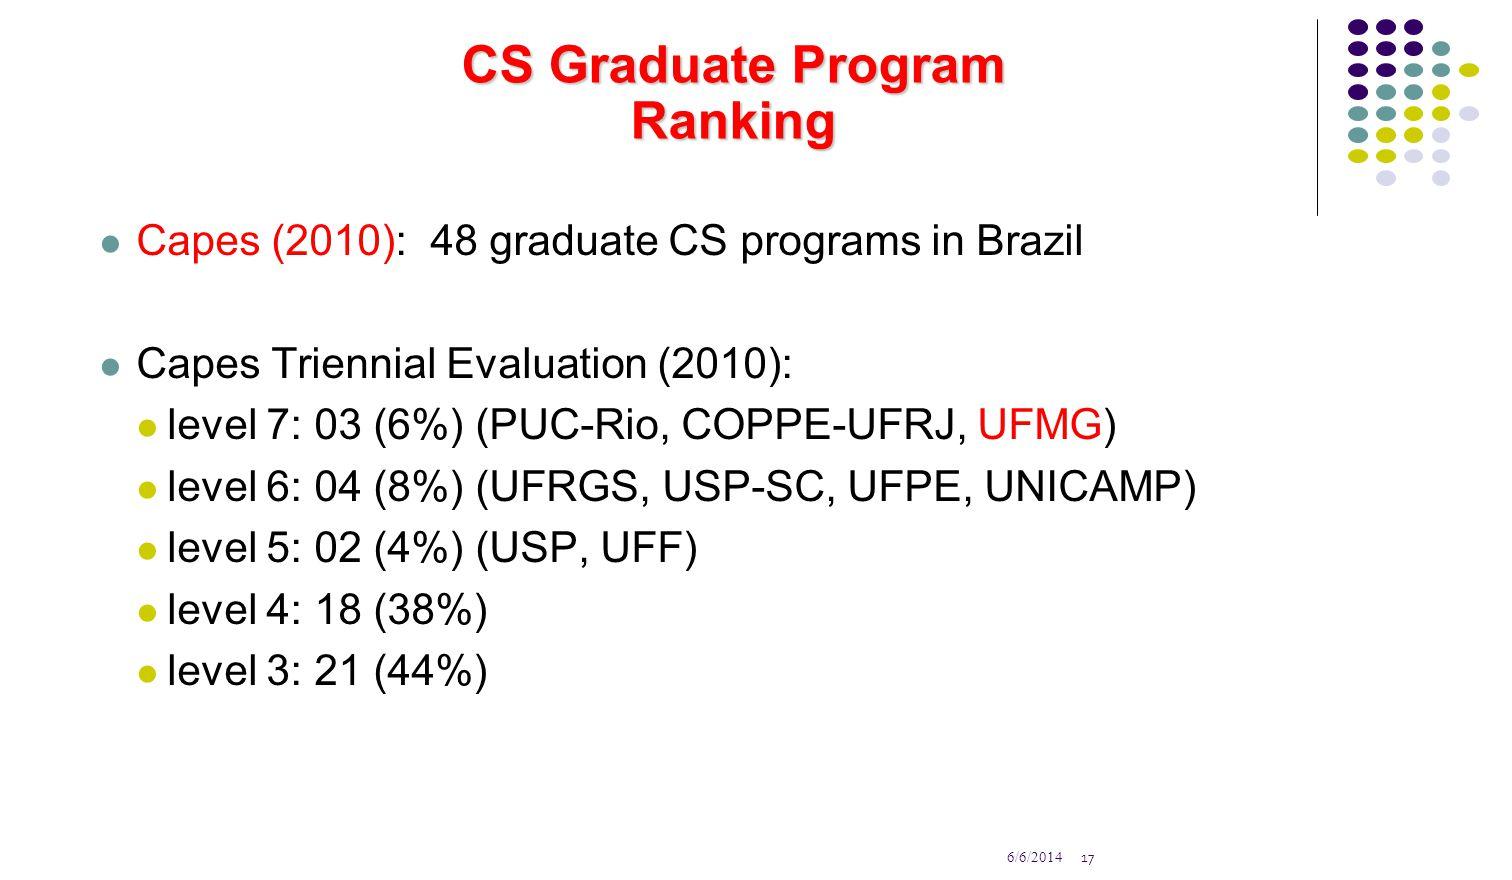 17 6/6/2014 CS Graduate Program Ranking Capes (2010): 48 graduate CS programs in Brazil Capes Triennial Evaluation (2010): level 7: 03 (6%) (PUC-Rio,